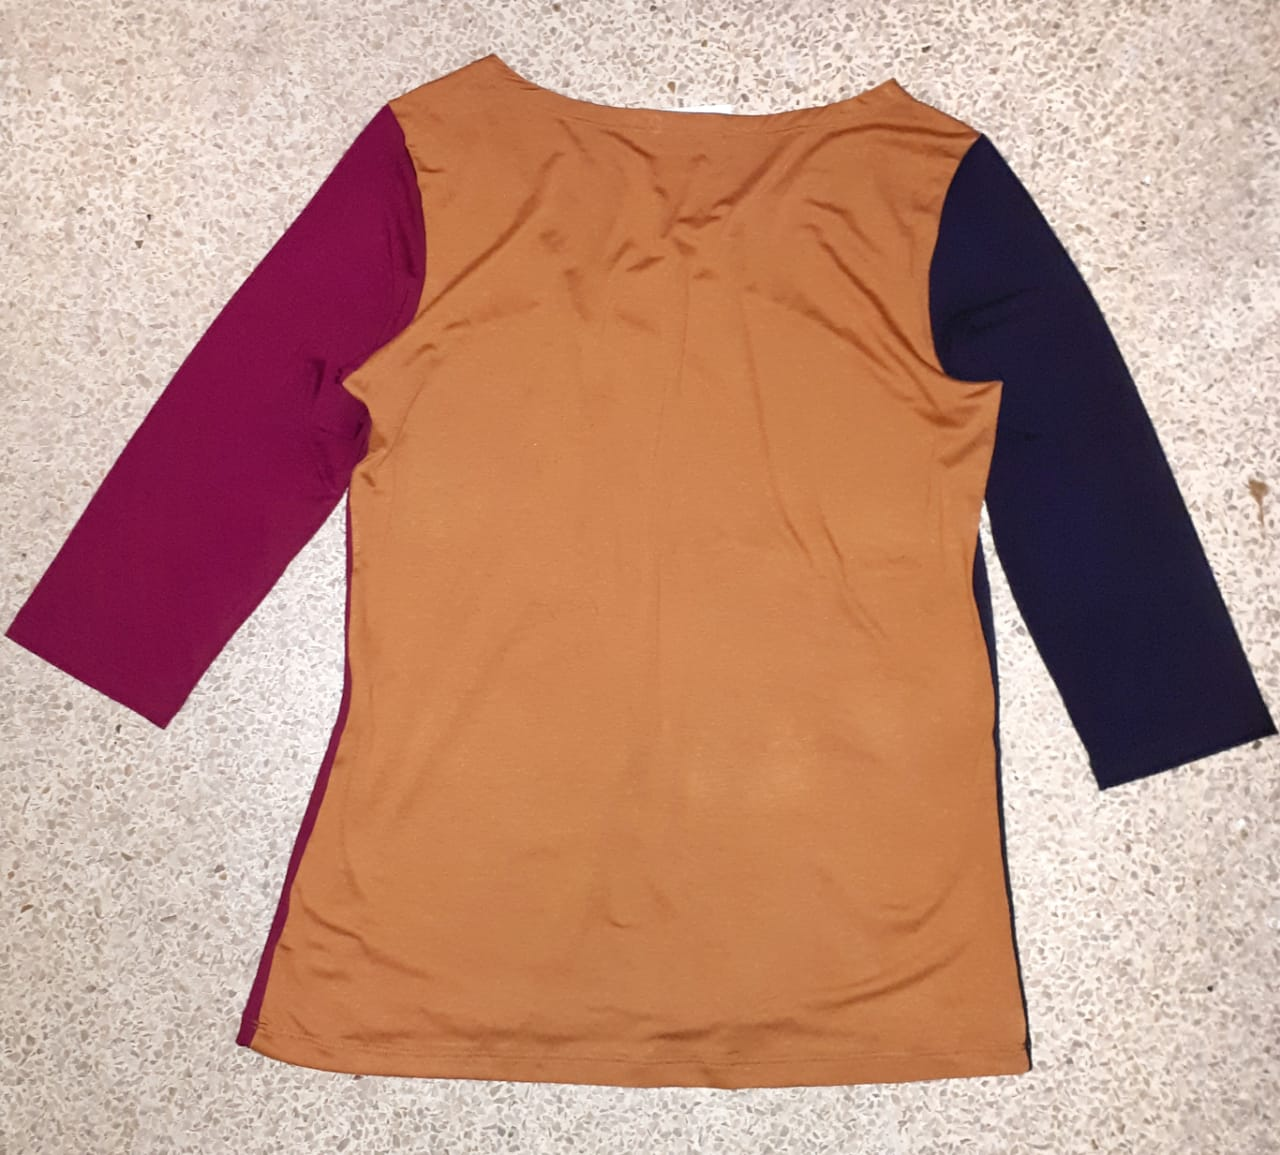 Blusa malha três cores